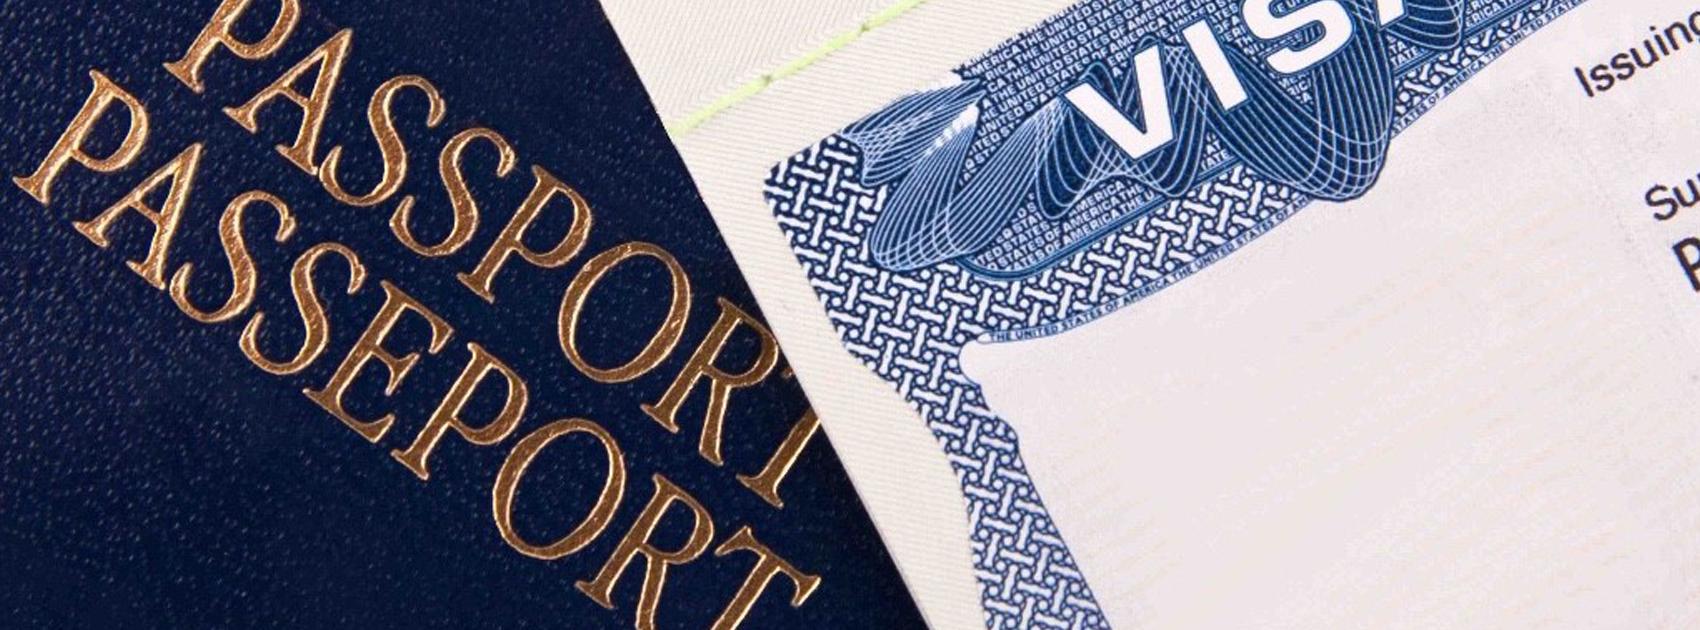 Zimbabwe_Visa